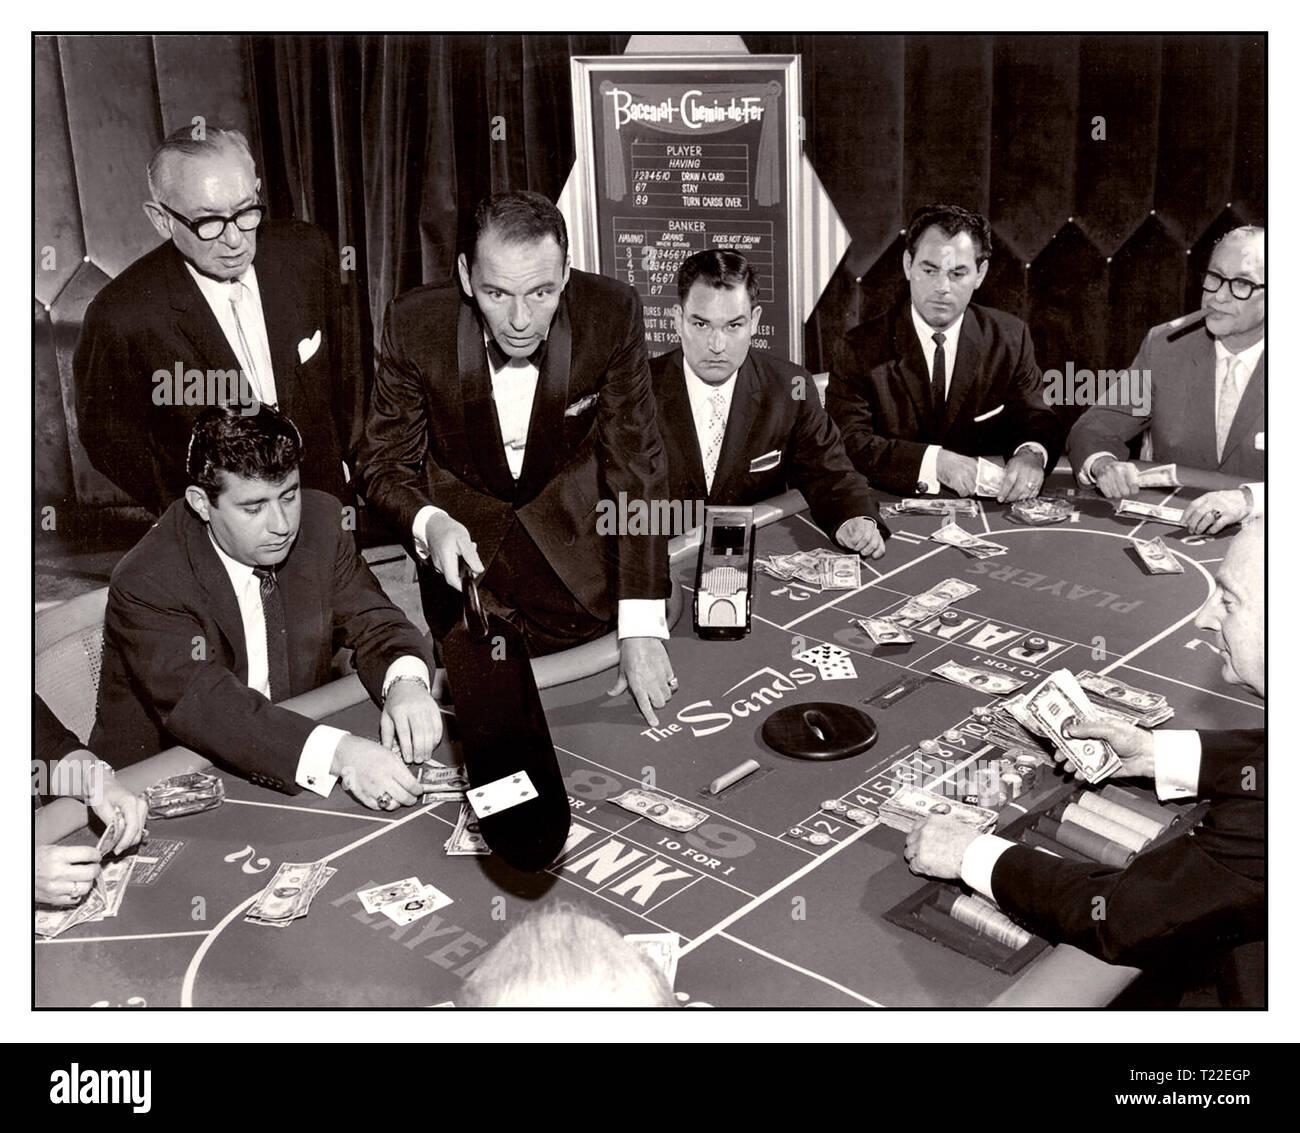 1950's Frank Sinatra in formal black tie dinner jacket, in gambling situation dealing baccarat in the Sands Casino, Las Vegas, November 1959 Sands Casino Las Vegas Nevada USA - Stock Image